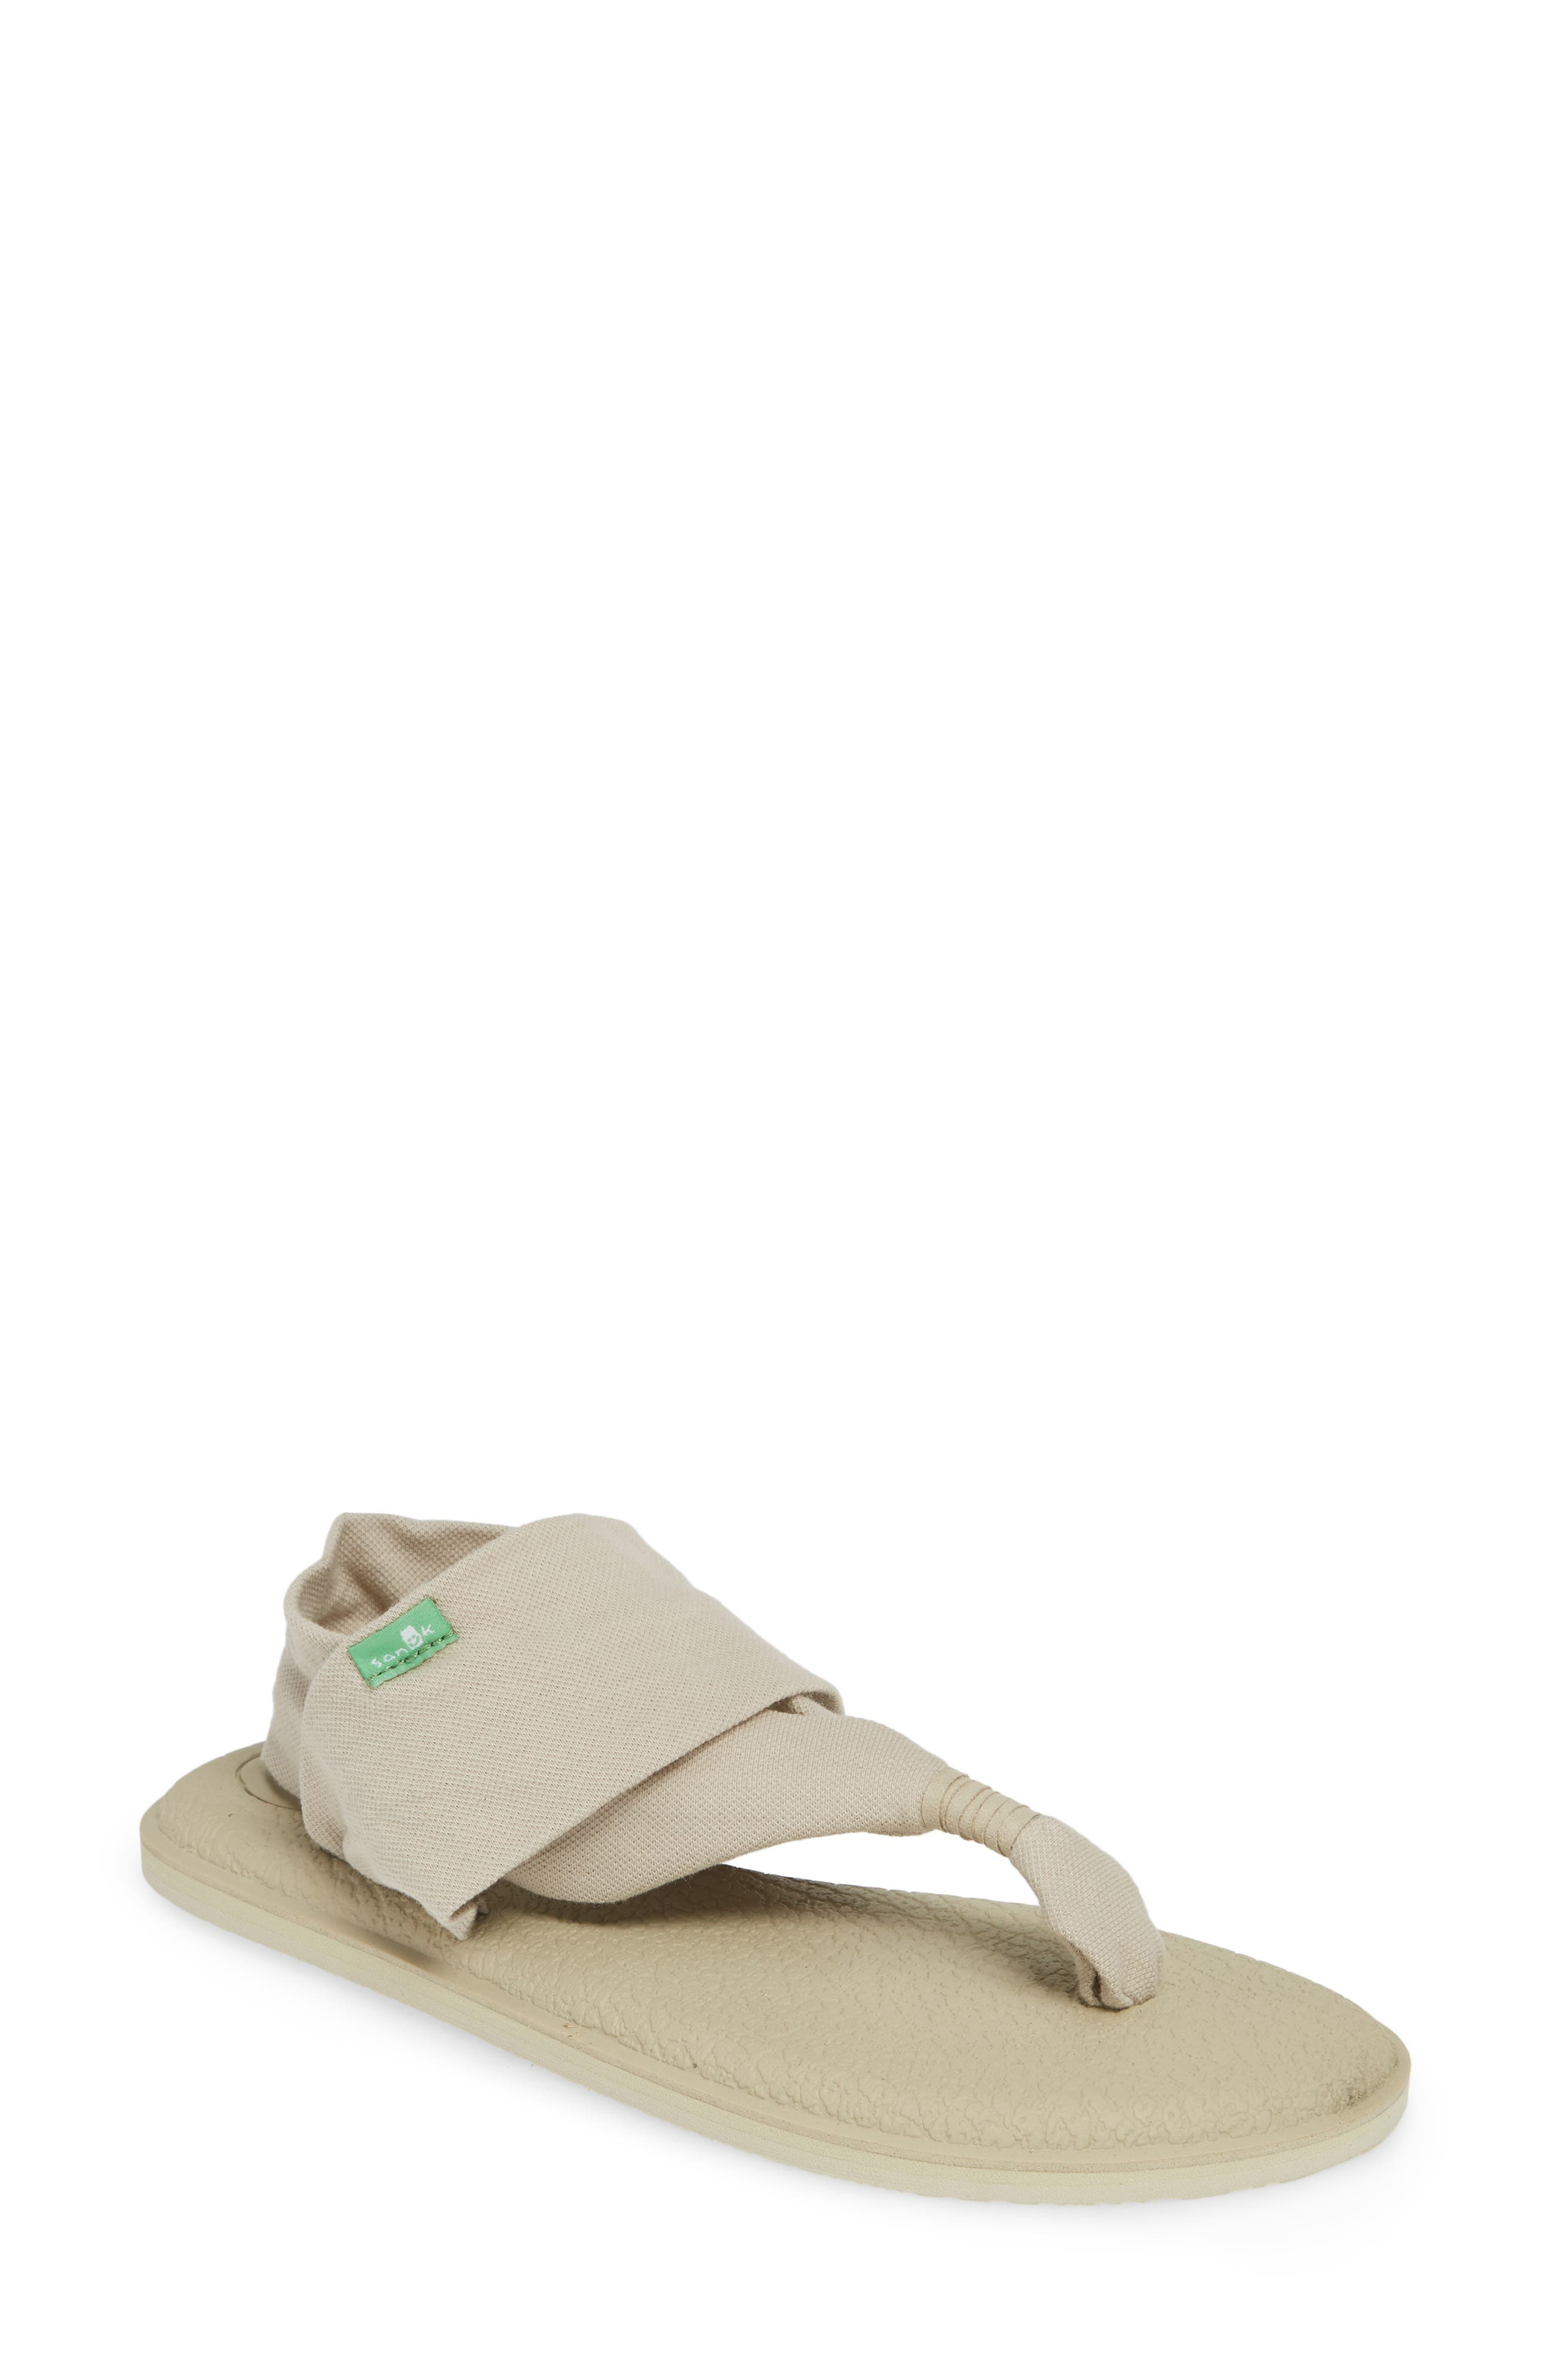 SANUK Yoga Sling 2 Metallic Sandal, Main, color, PEYOTE / METALLIC CHAMPAGNE